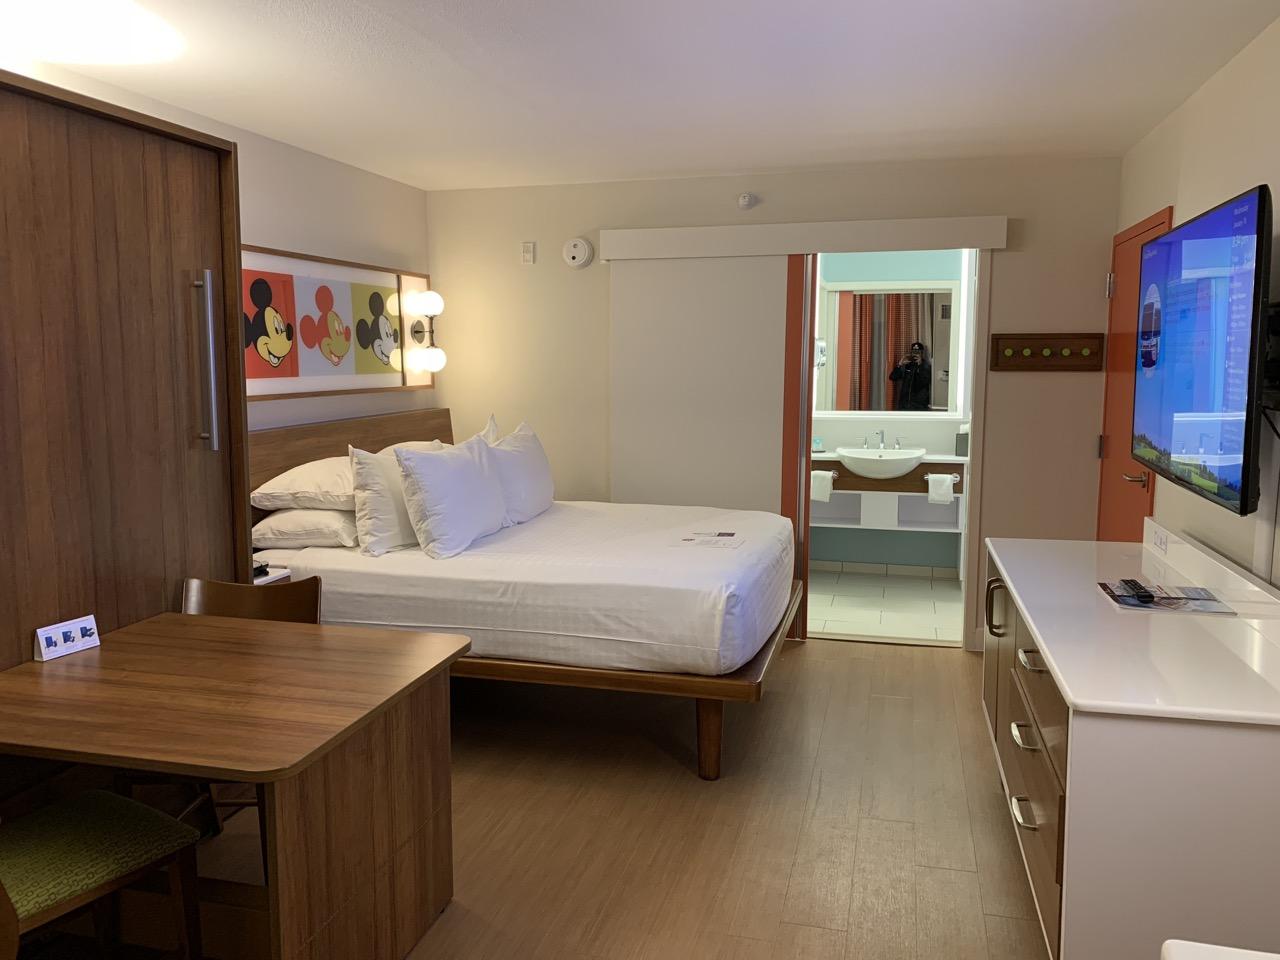 disney world budget planning guide 03 hotels.jpeg